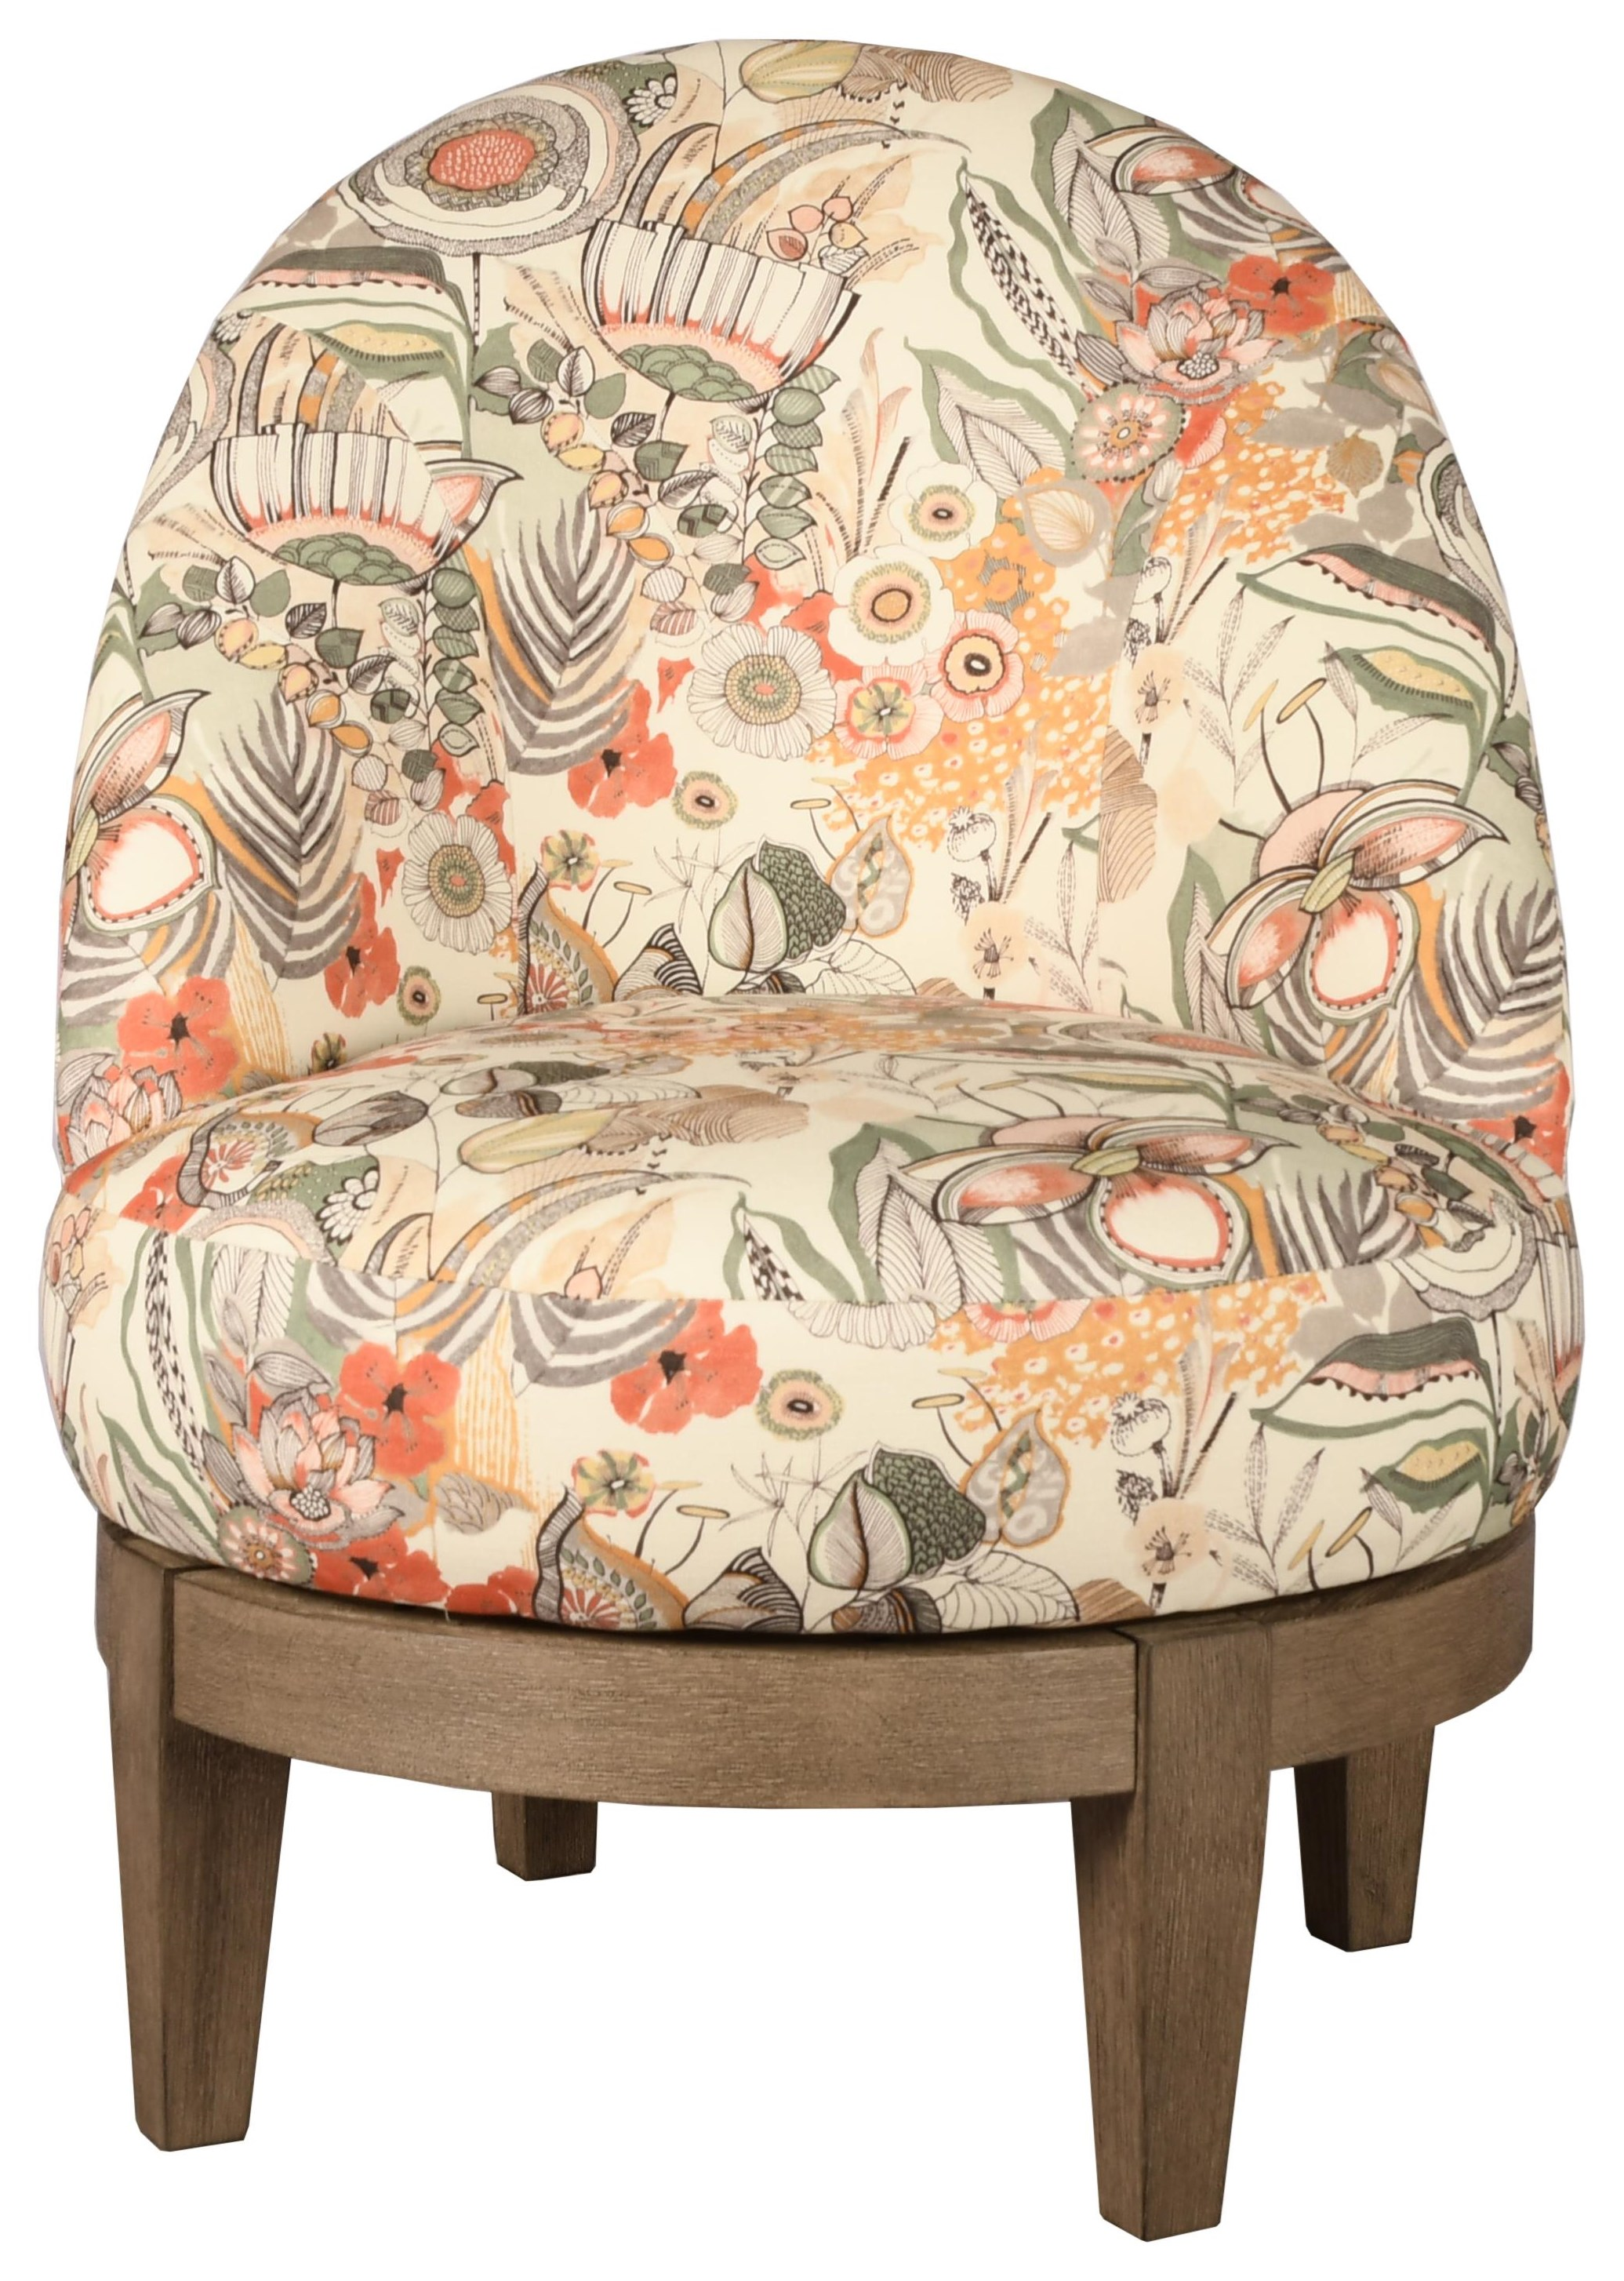 Loflin Swivel Chair by Bravo Furniture at Bennett's Furniture and Mattresses